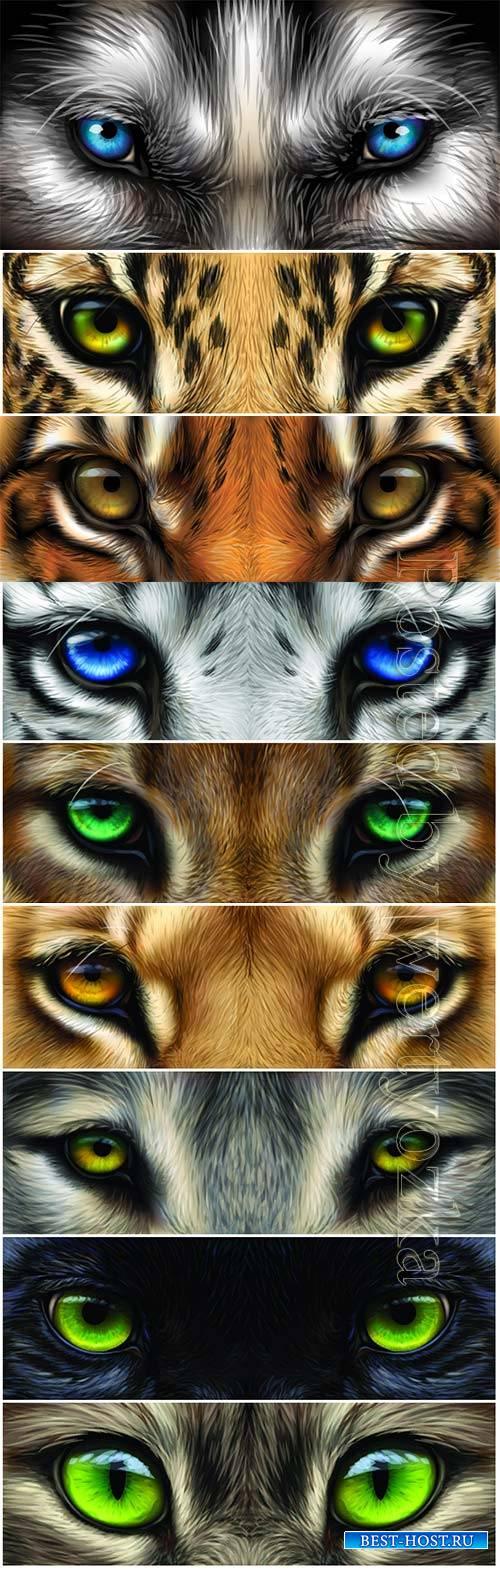 Big eyes animals close-up